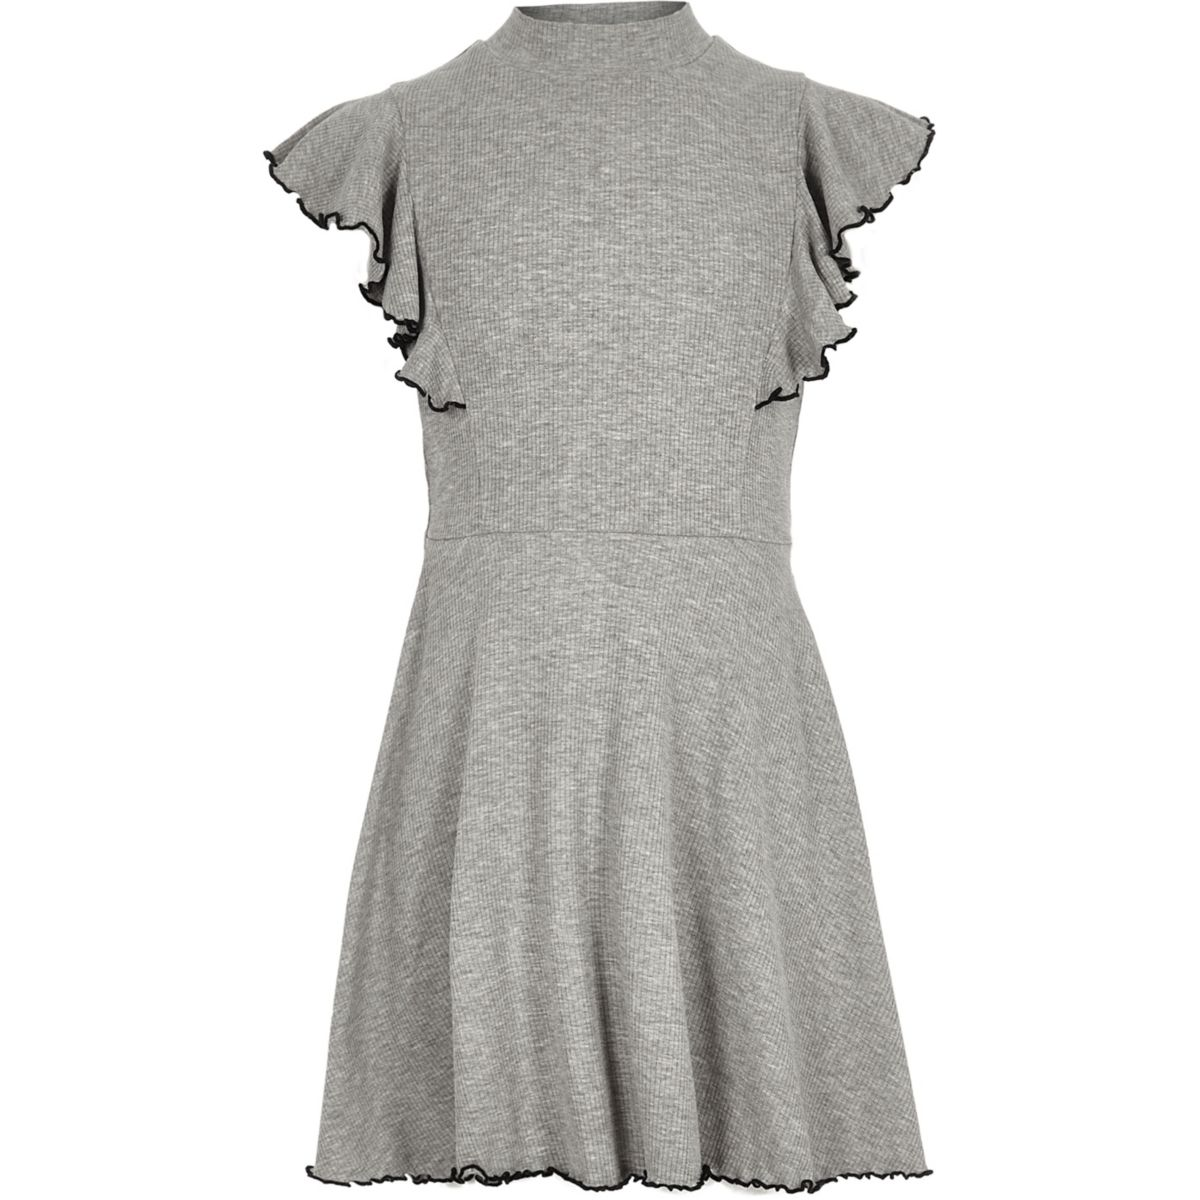 Girls grey ribbed high neck skater dress